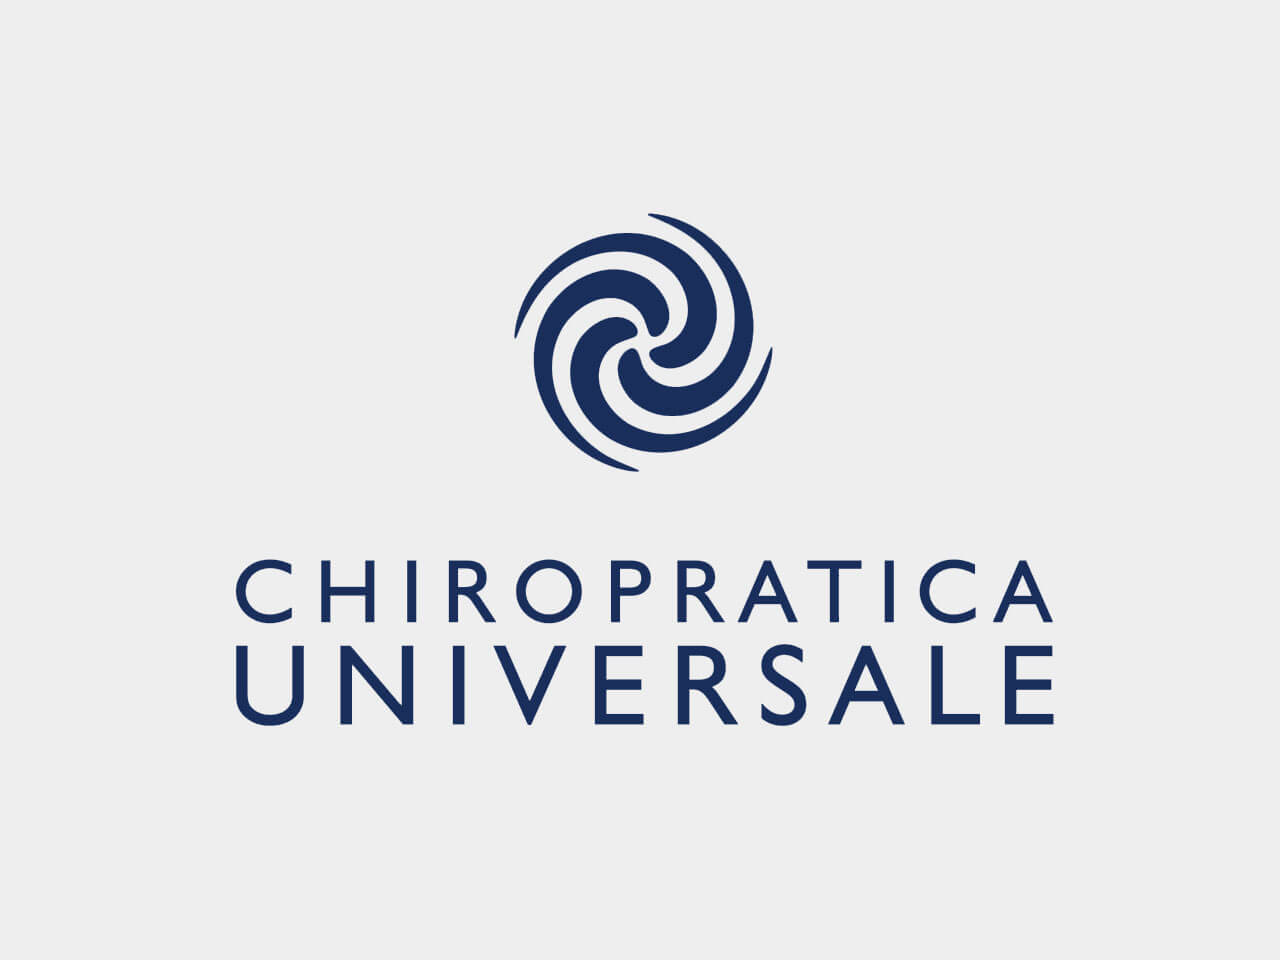 Chiropratica Universale post featured image